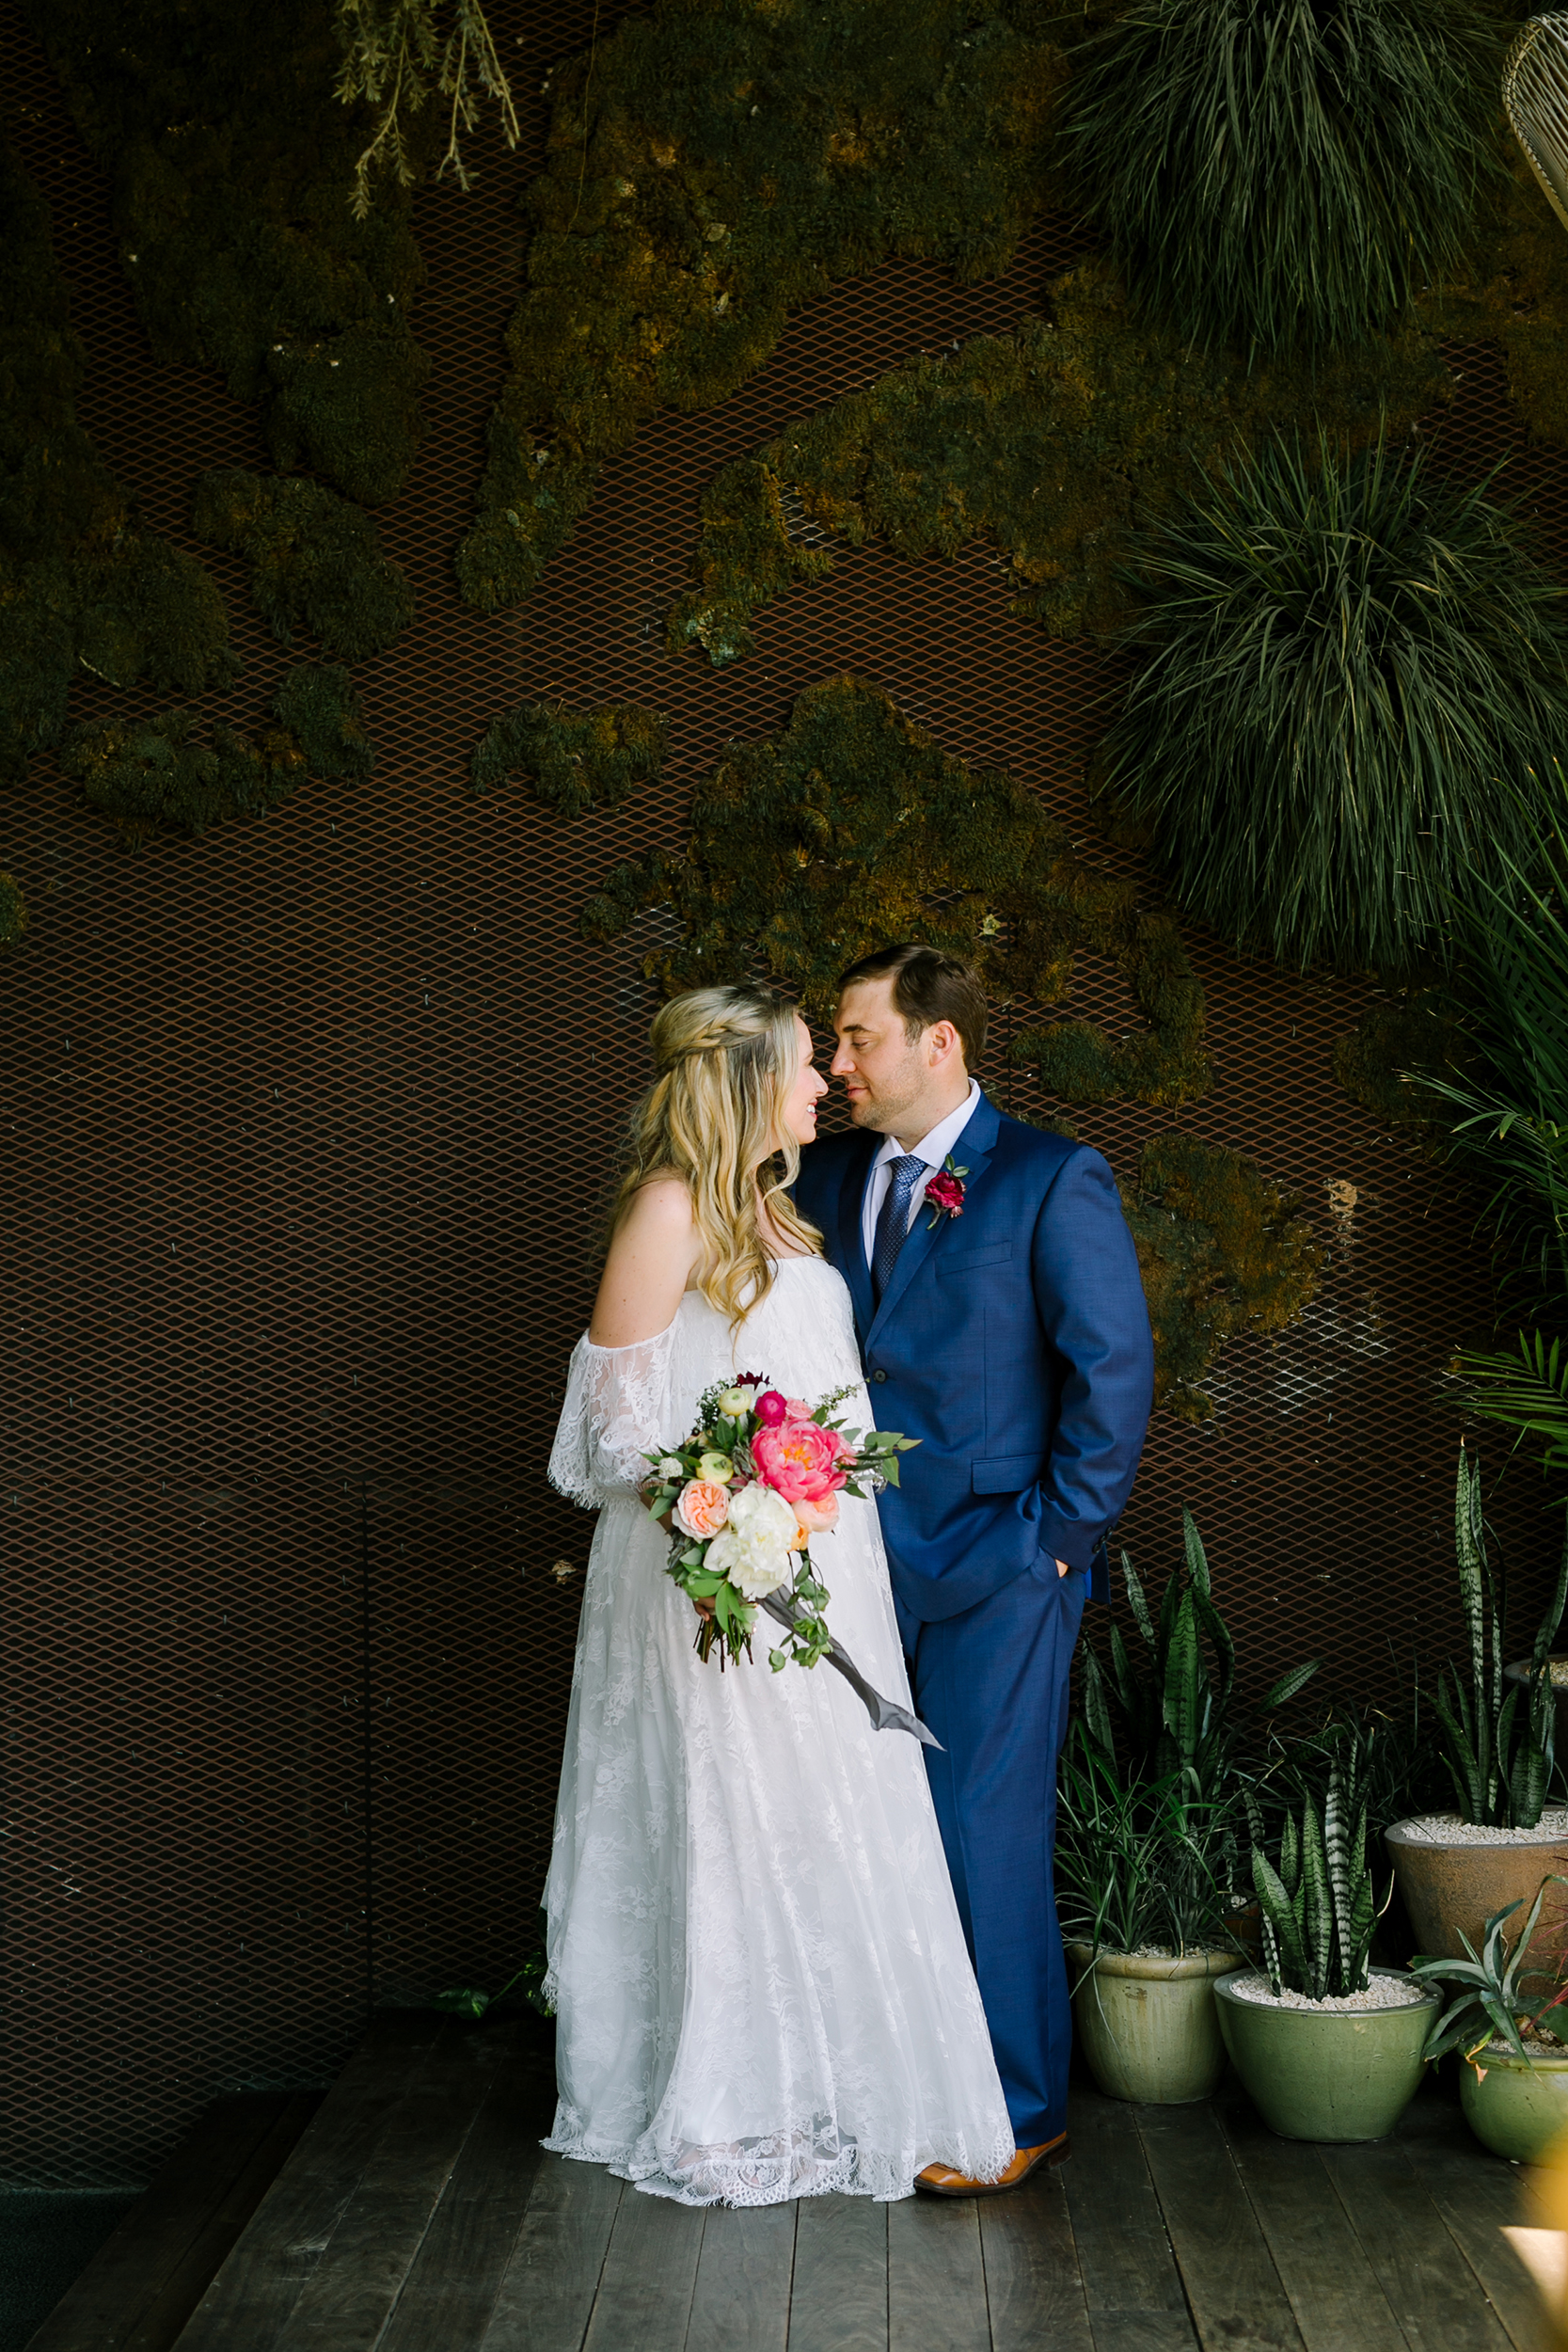 Austin_Wedding_Photographer_Kimberly_Brooke_Photographic_022.jpg